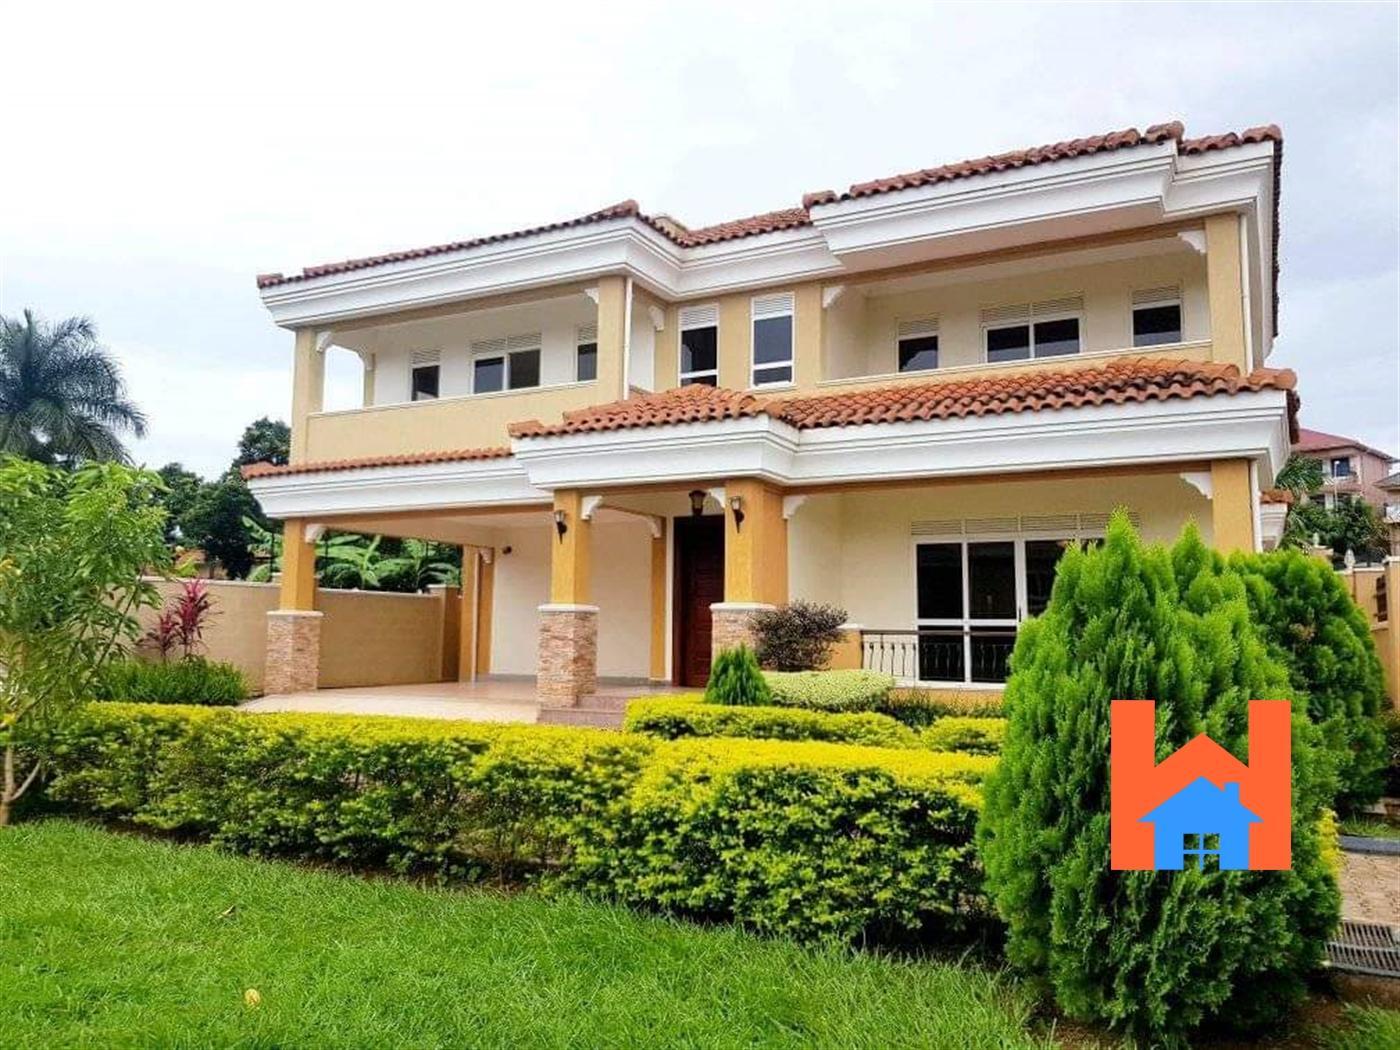 Villa for sale in Munyonyo Kampala